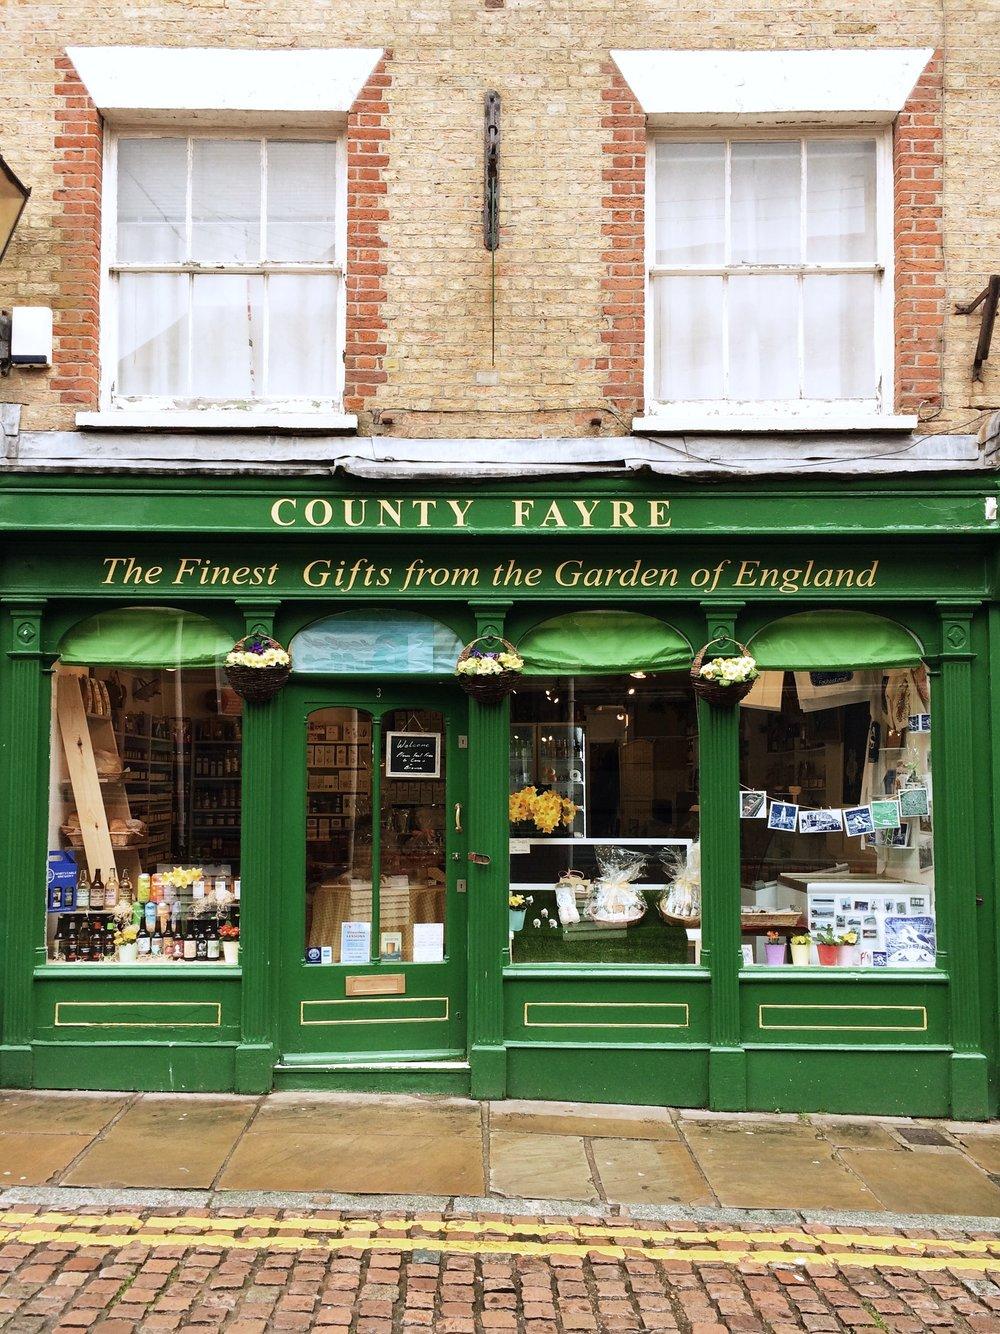 County Fayre by Small Acorns.jpg